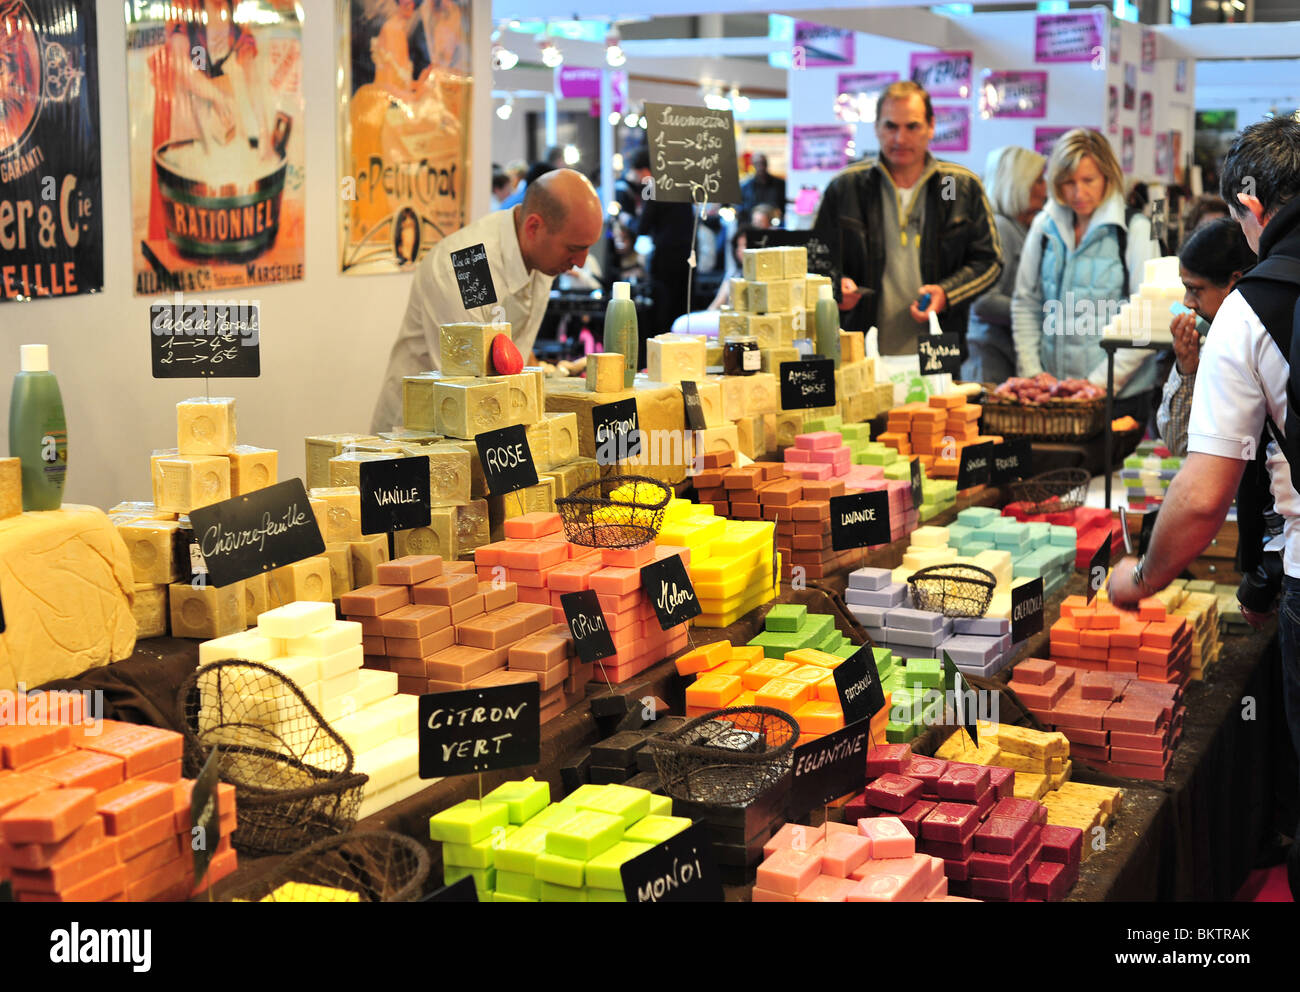 [Image: handmade-natural-soap-shop-paris-fair-2010-BKTRAK.jpg]